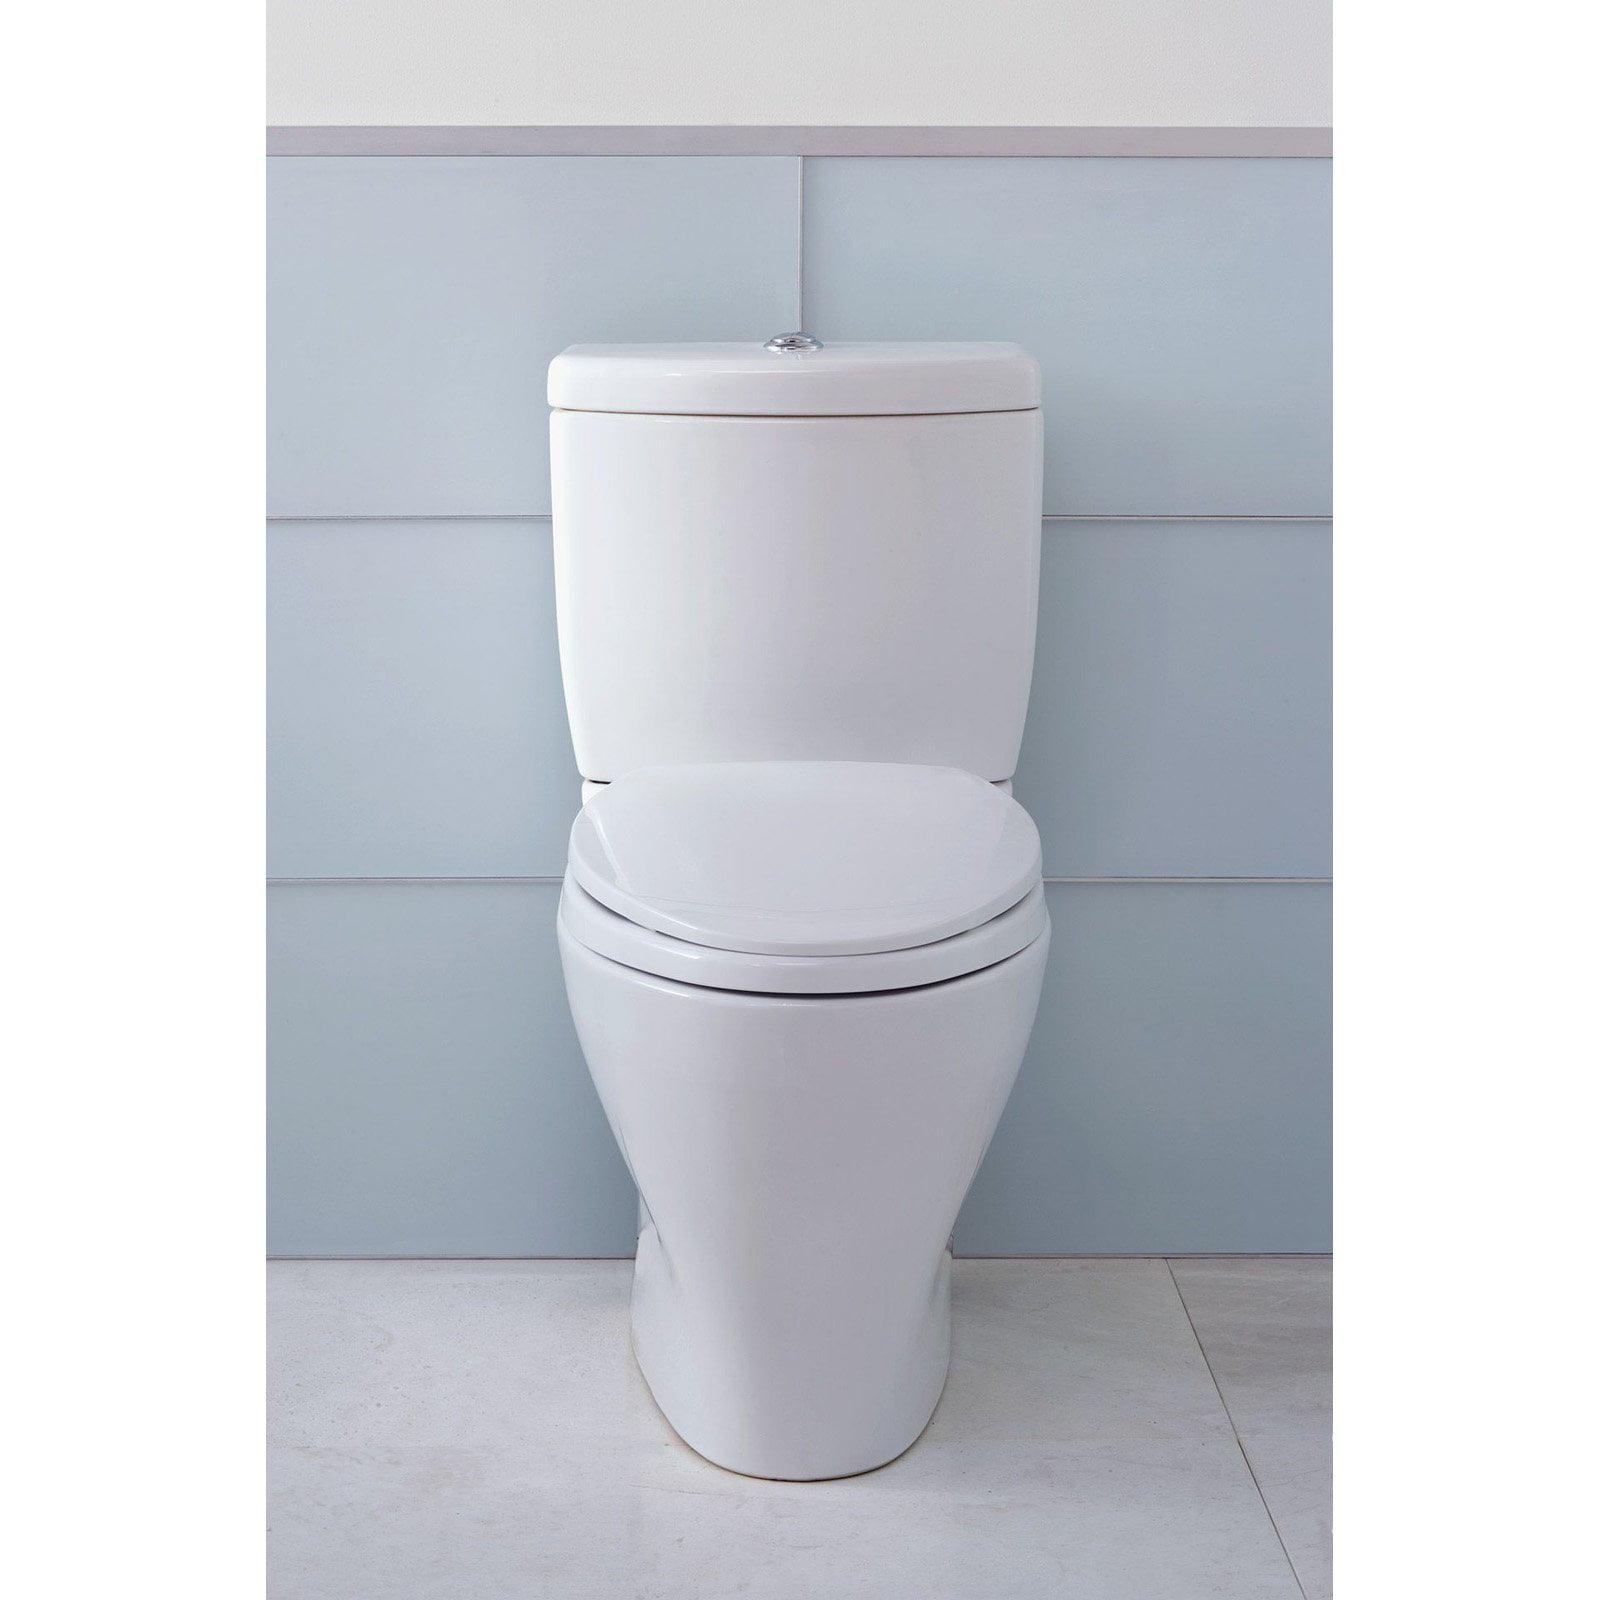 Manual da feac up flush toilet